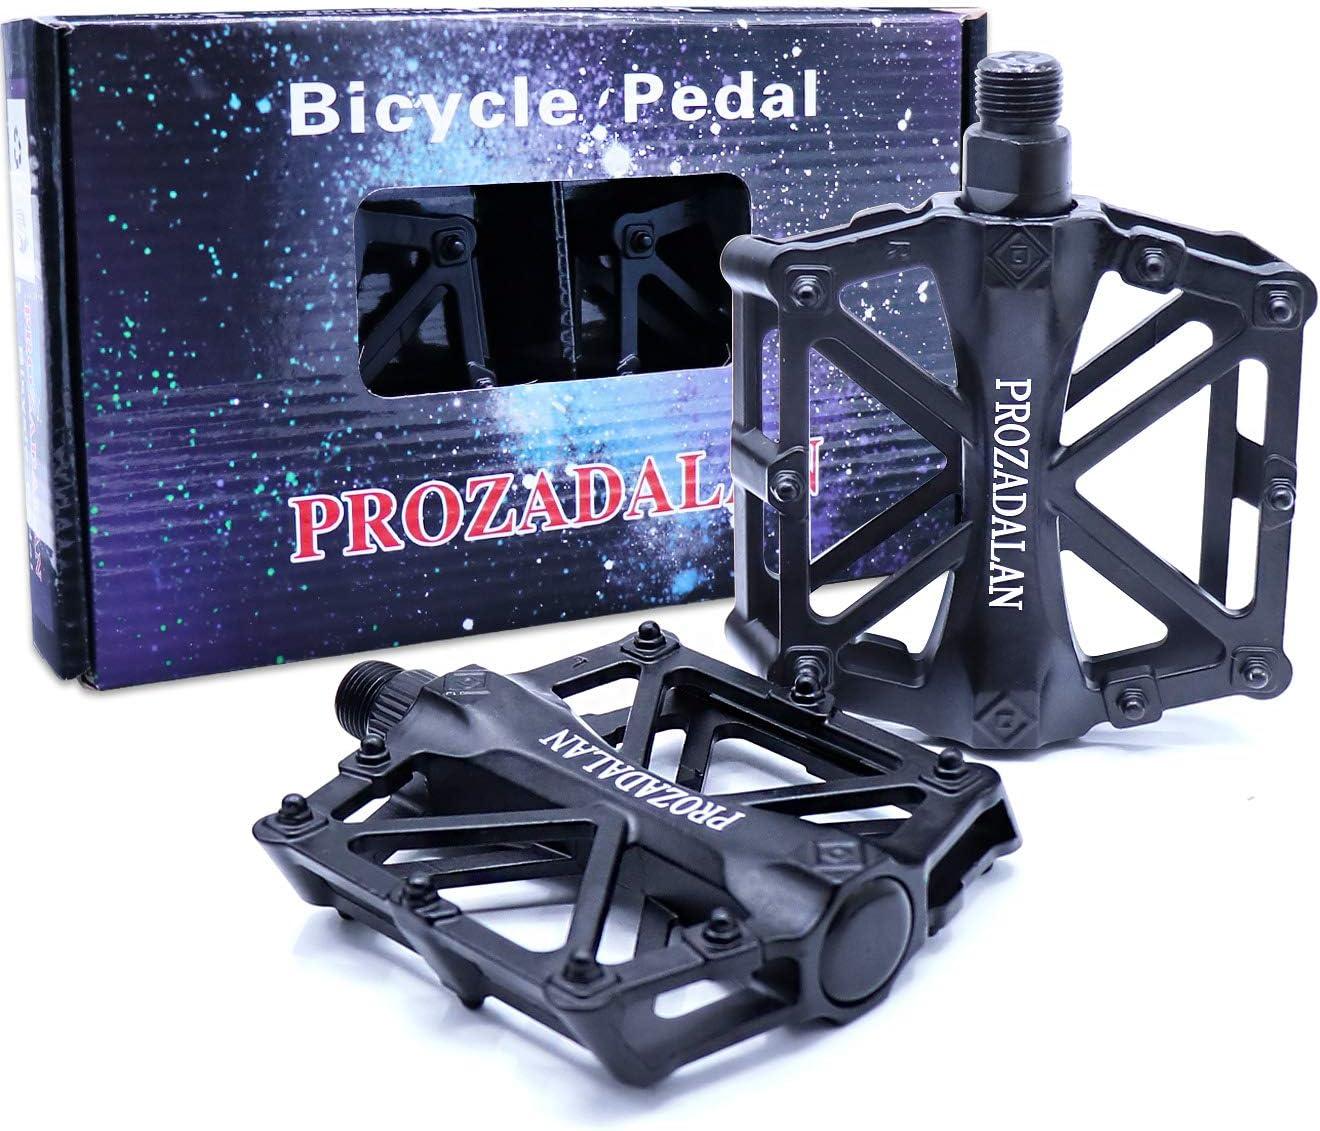 PROZADALAN Pedales Bicicleta, Pedals Impermeable 9/16 Pulgadas con Sellado Antideslizante Durable/Herramienta de Instalación Gratuita, para Bicicleta de Montaña BMX Universal Bike Bike Trekking Bike